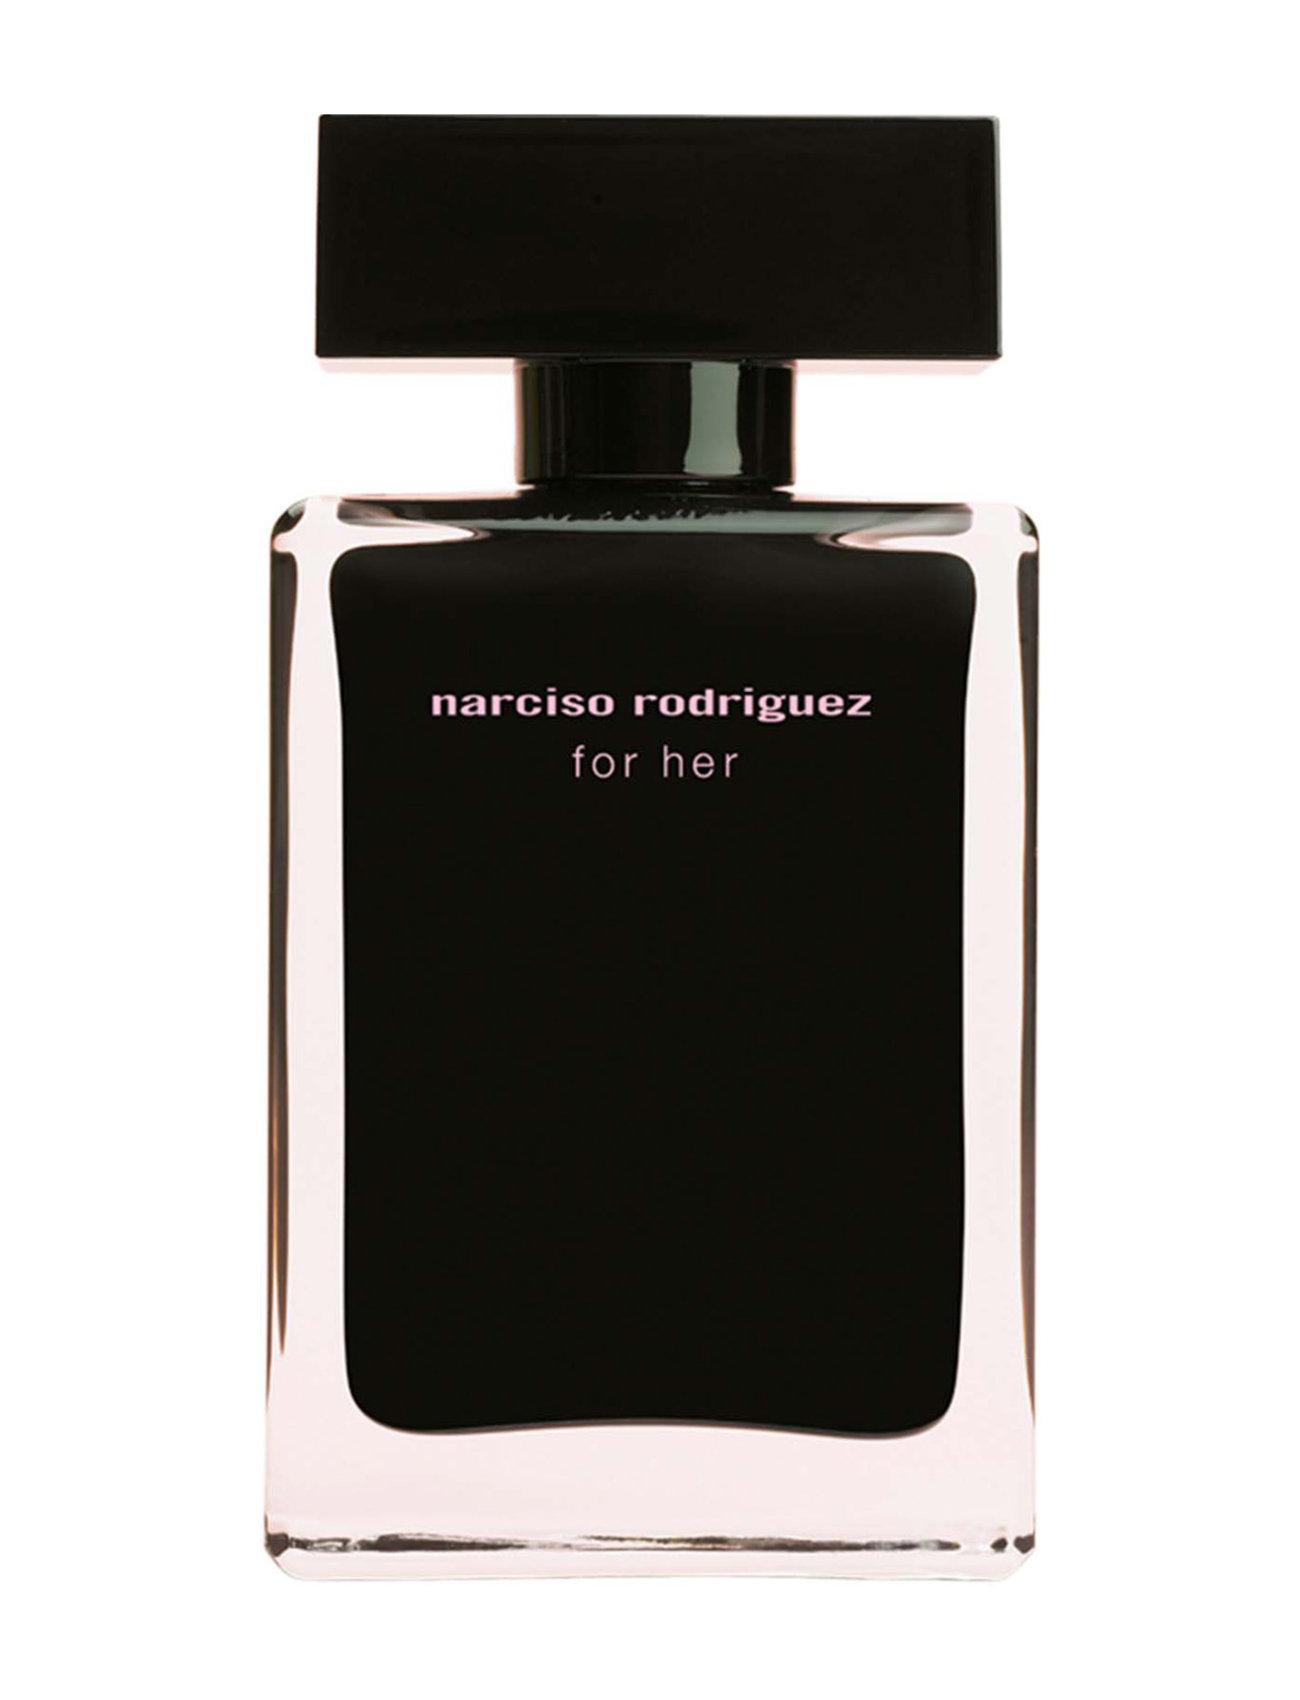 narciso rodriguez – Narciso rodriguez for her eau de to på boozt.com dk